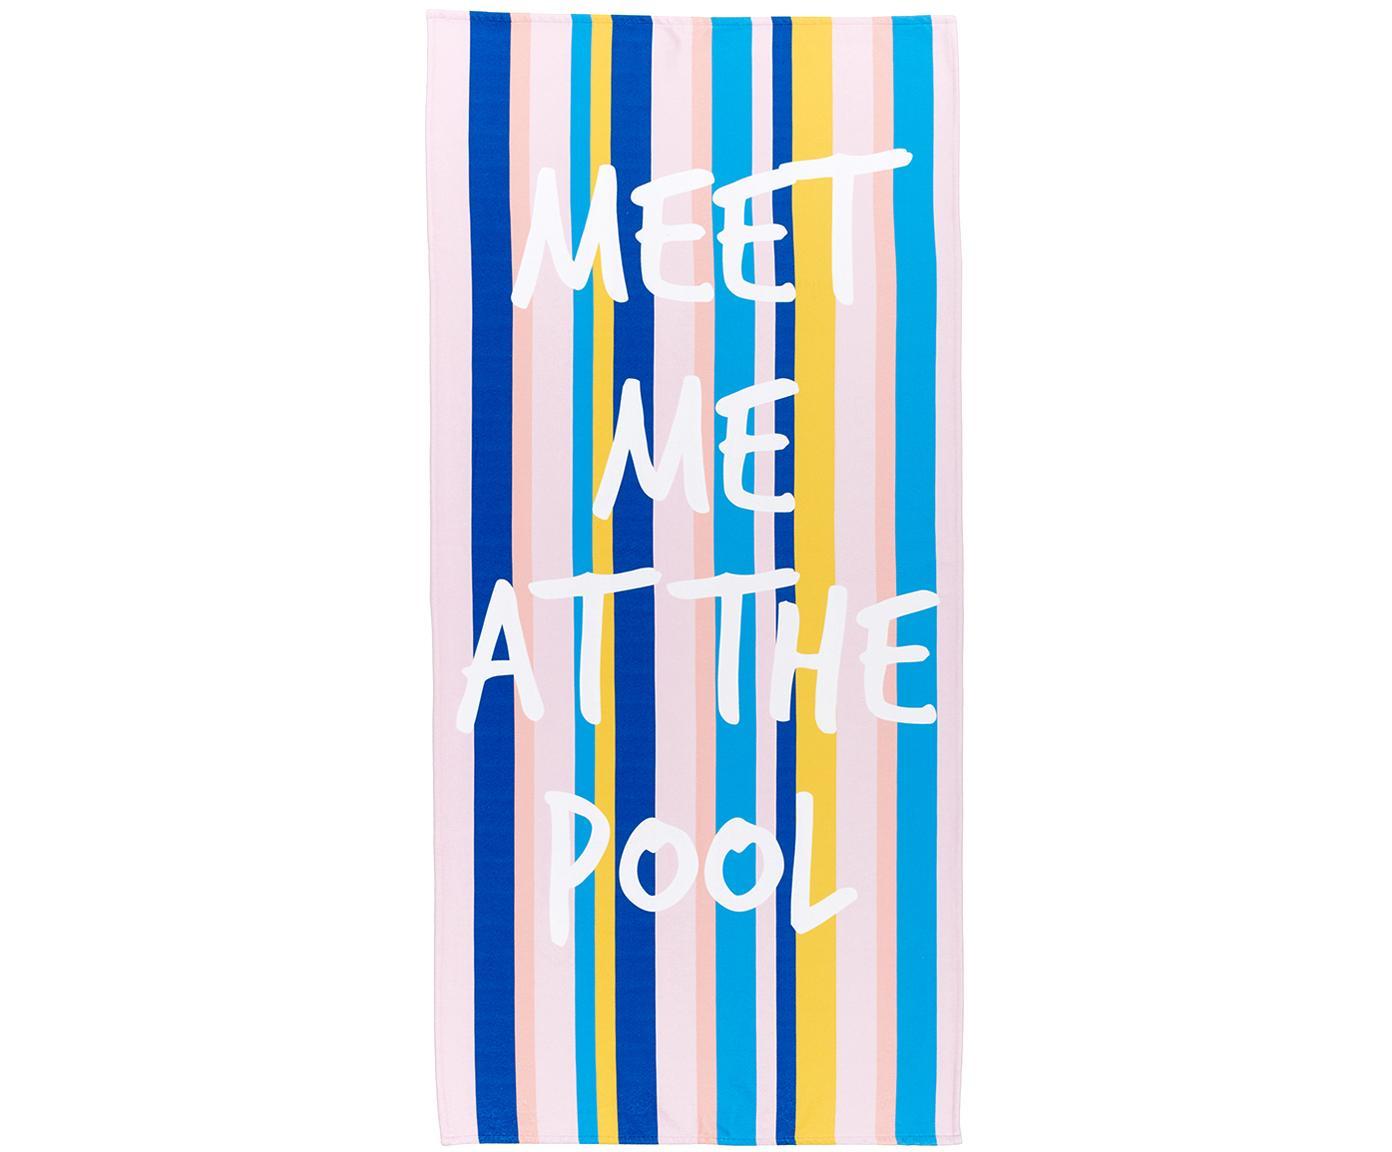 Toalla de playa ligera Meet Me, 55%poliéster, 45%algodón Gramaje ligero 340g/m², Multicolor, An 70 x L 150 cm